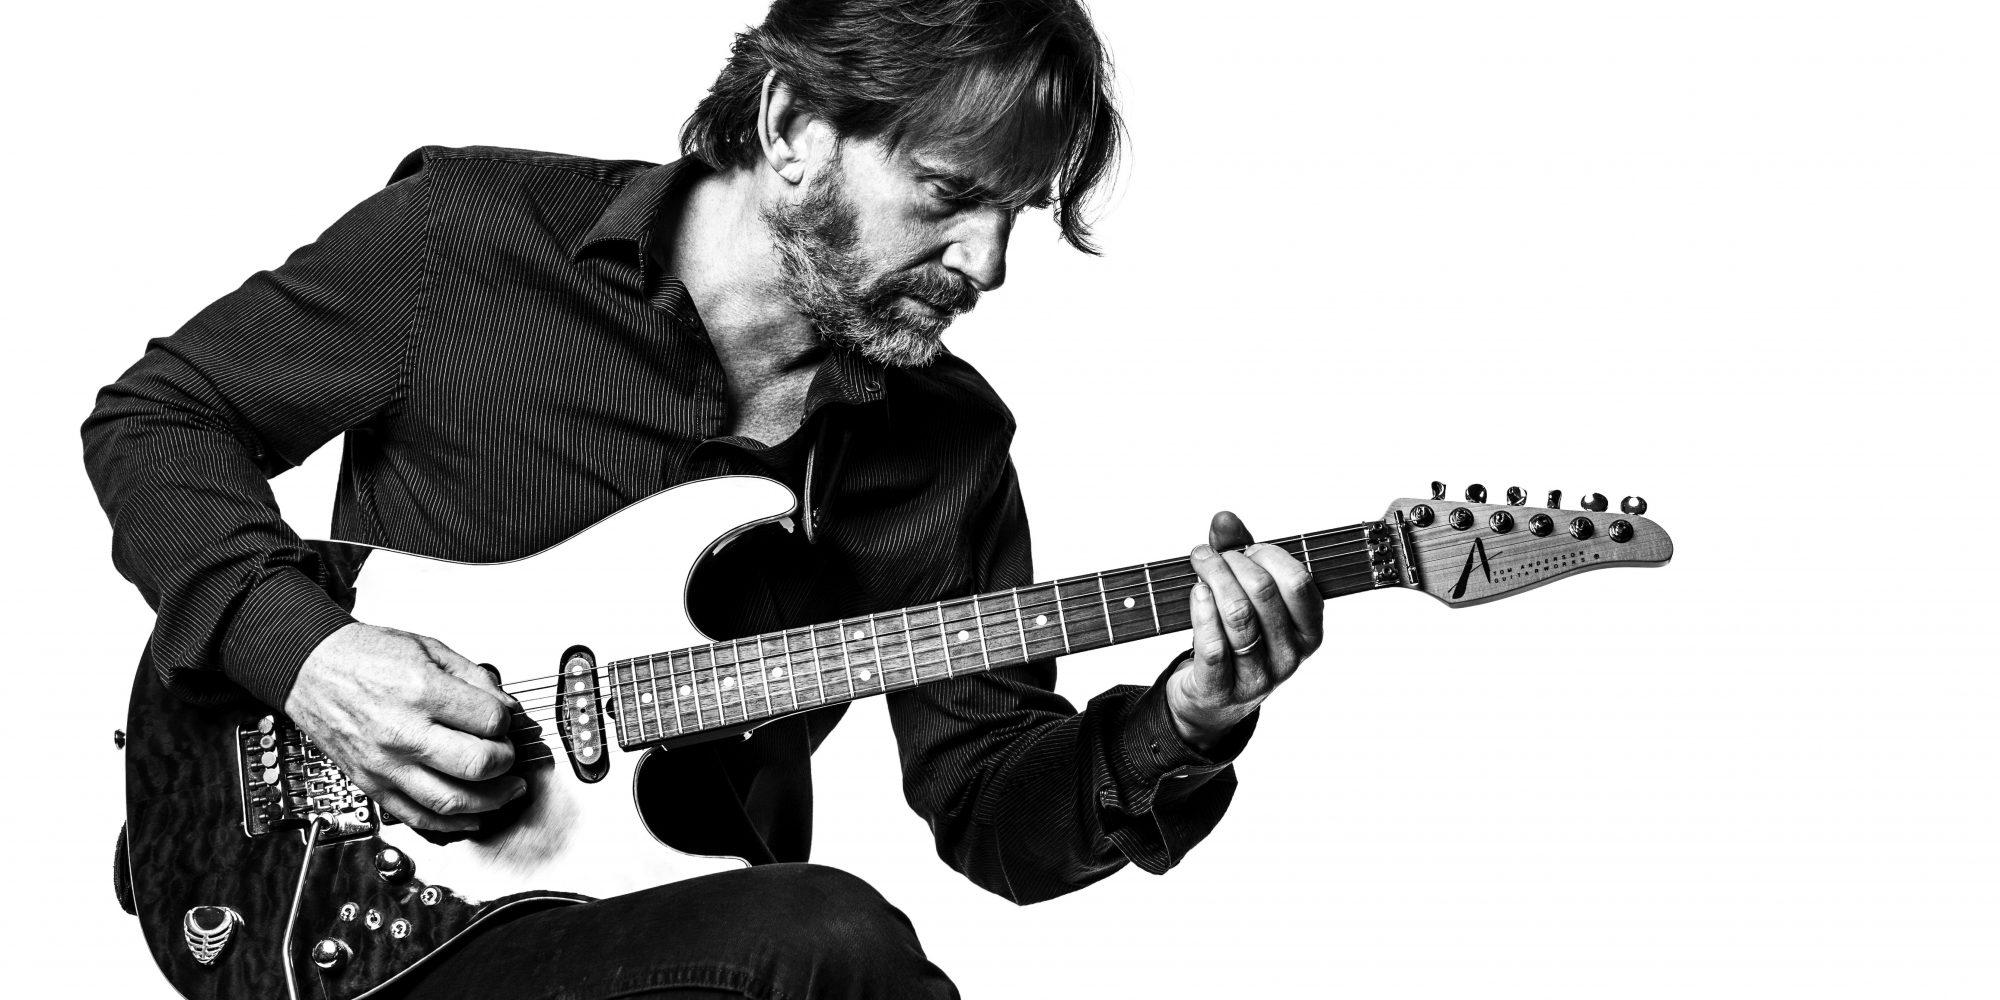 Steve Mackey, Grammy Award-winning guitarist and composer, in interview |  Precinct